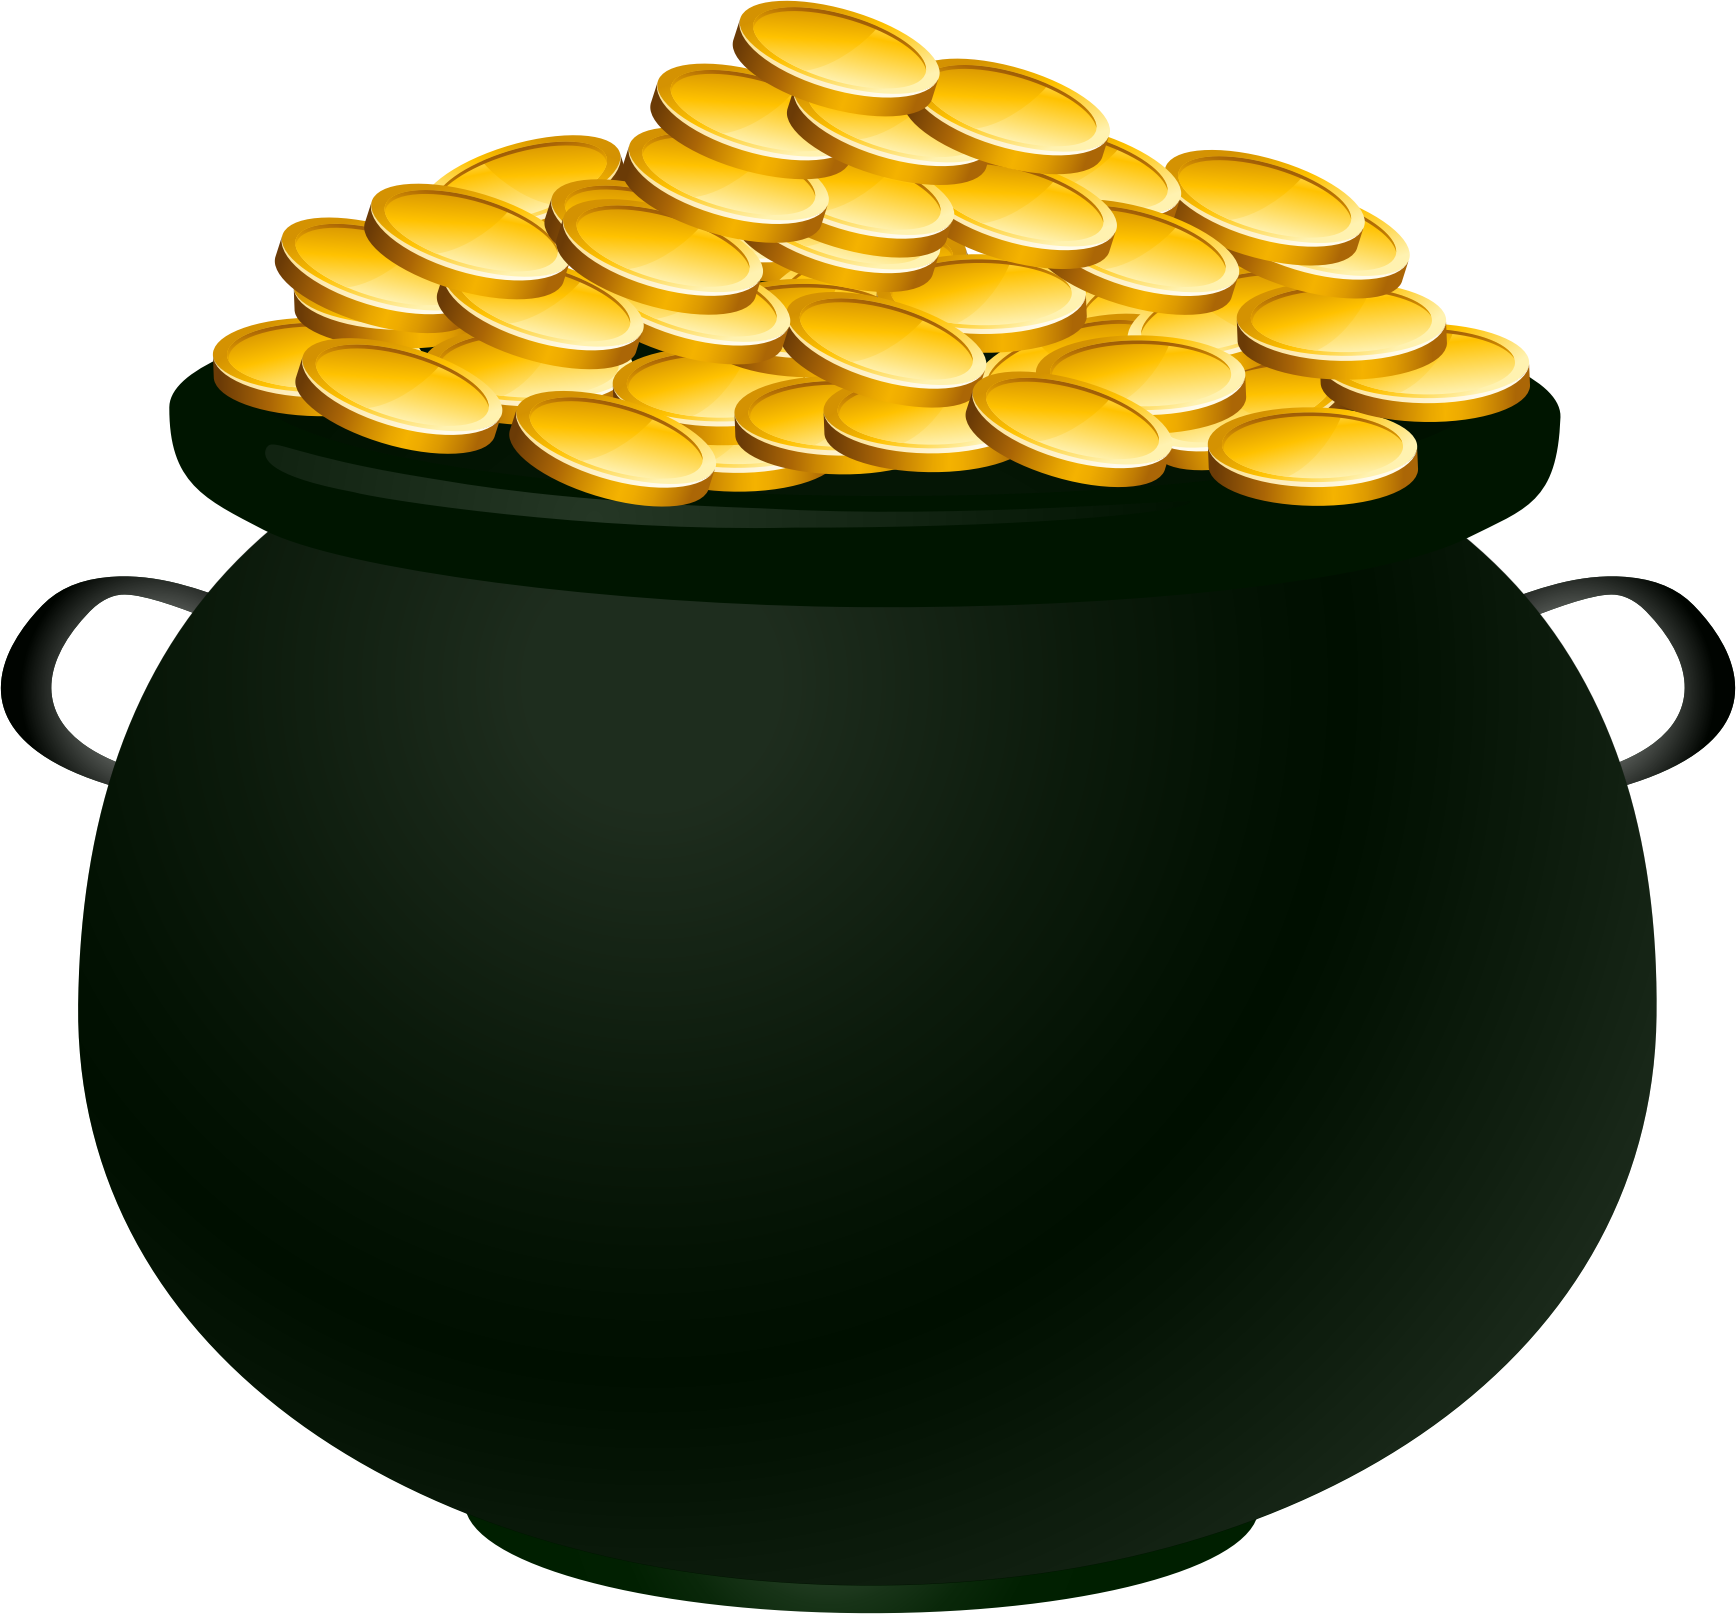 Free leprechaun pot of gold clipart.